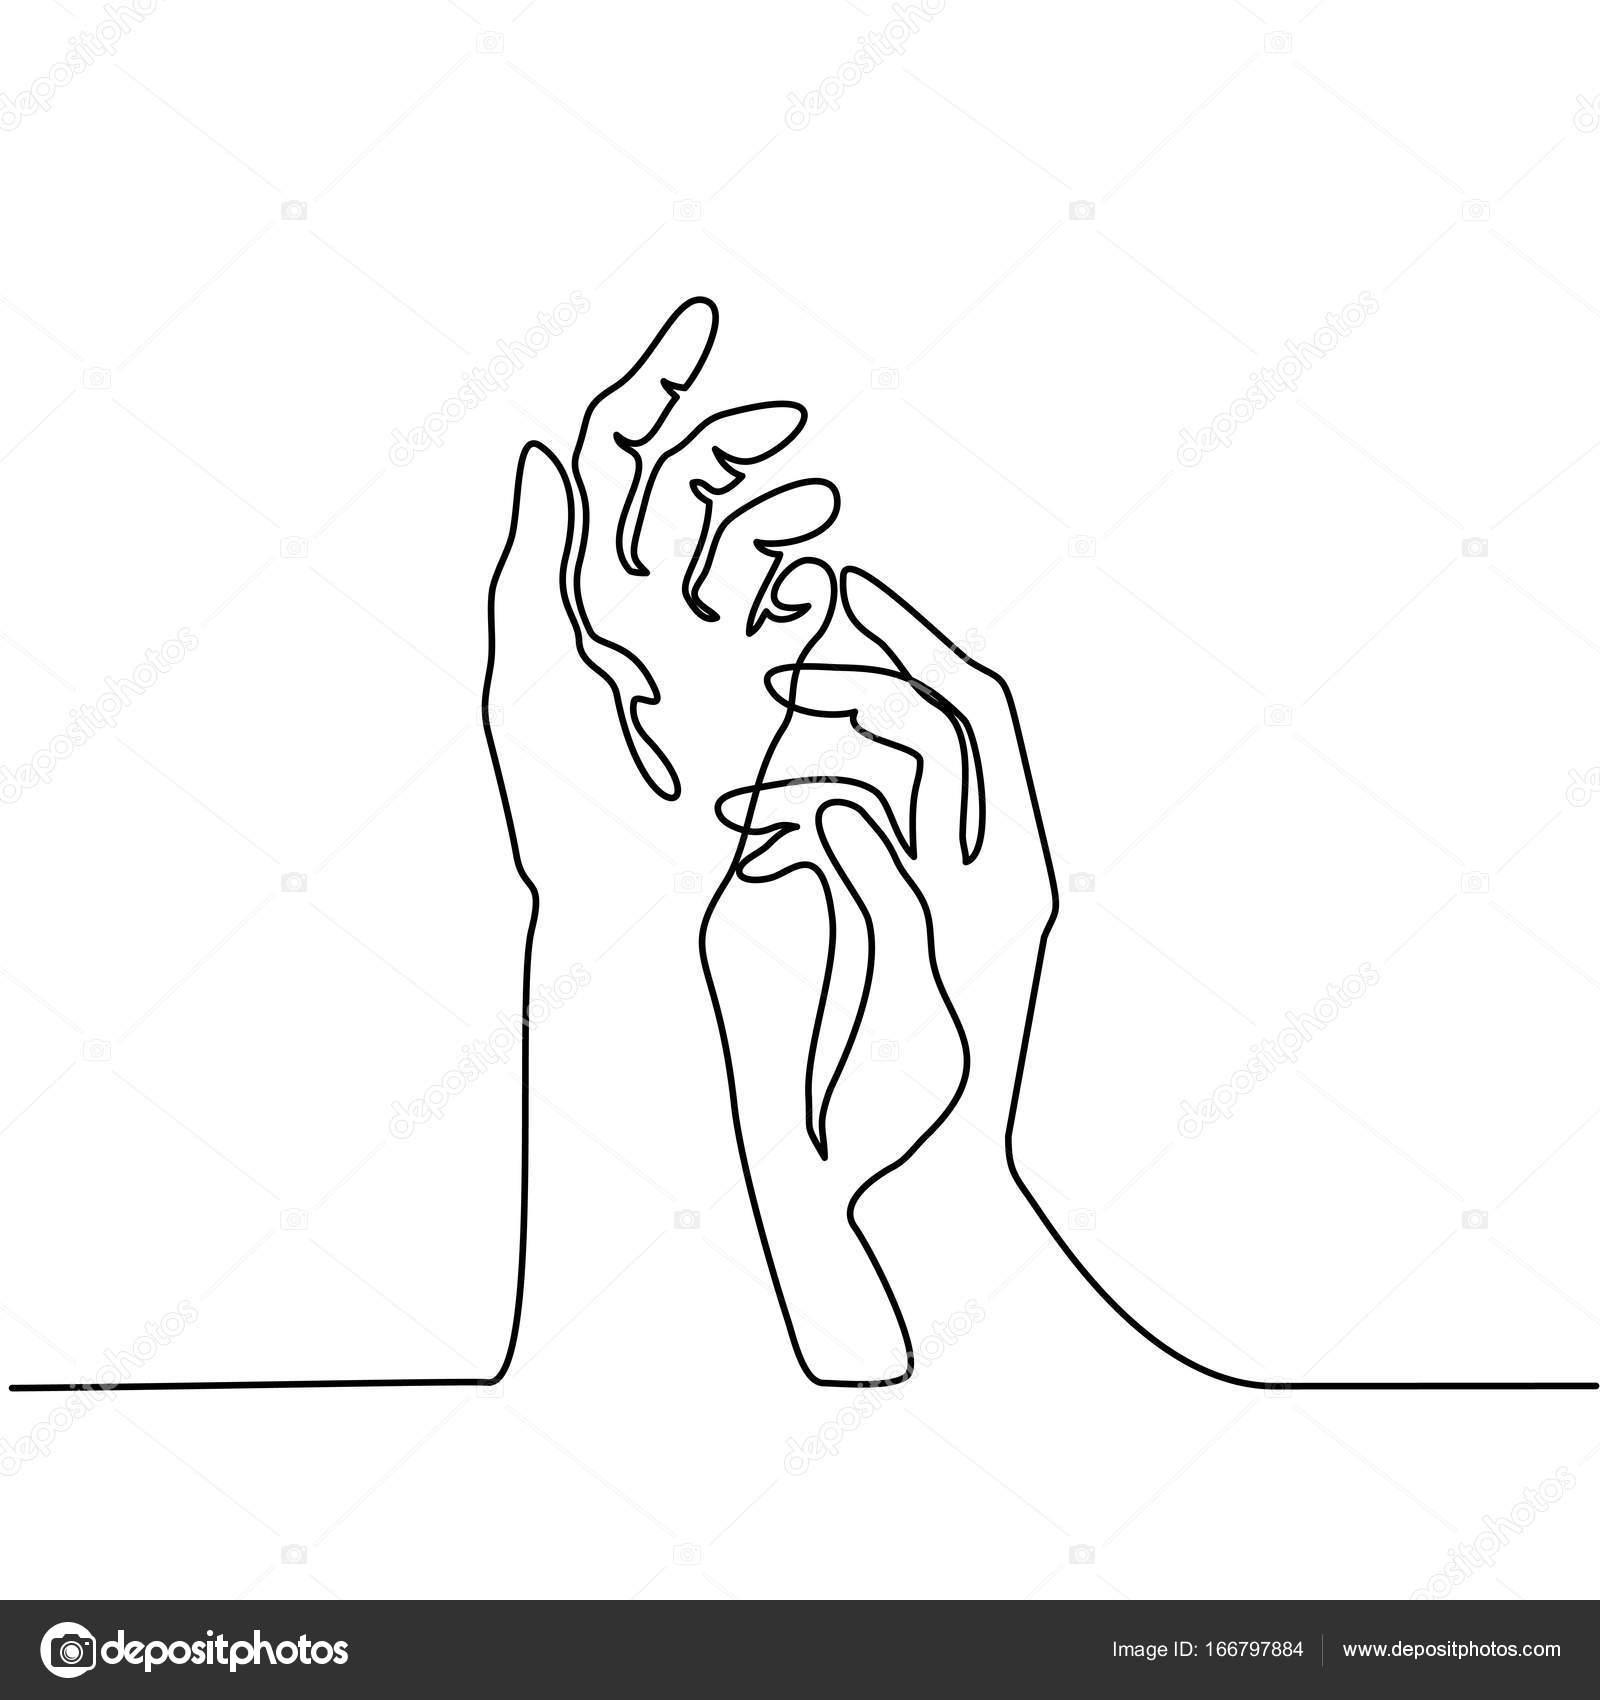 Drawing Lines With Three Js : Handpalmen samen — stockvector valenty